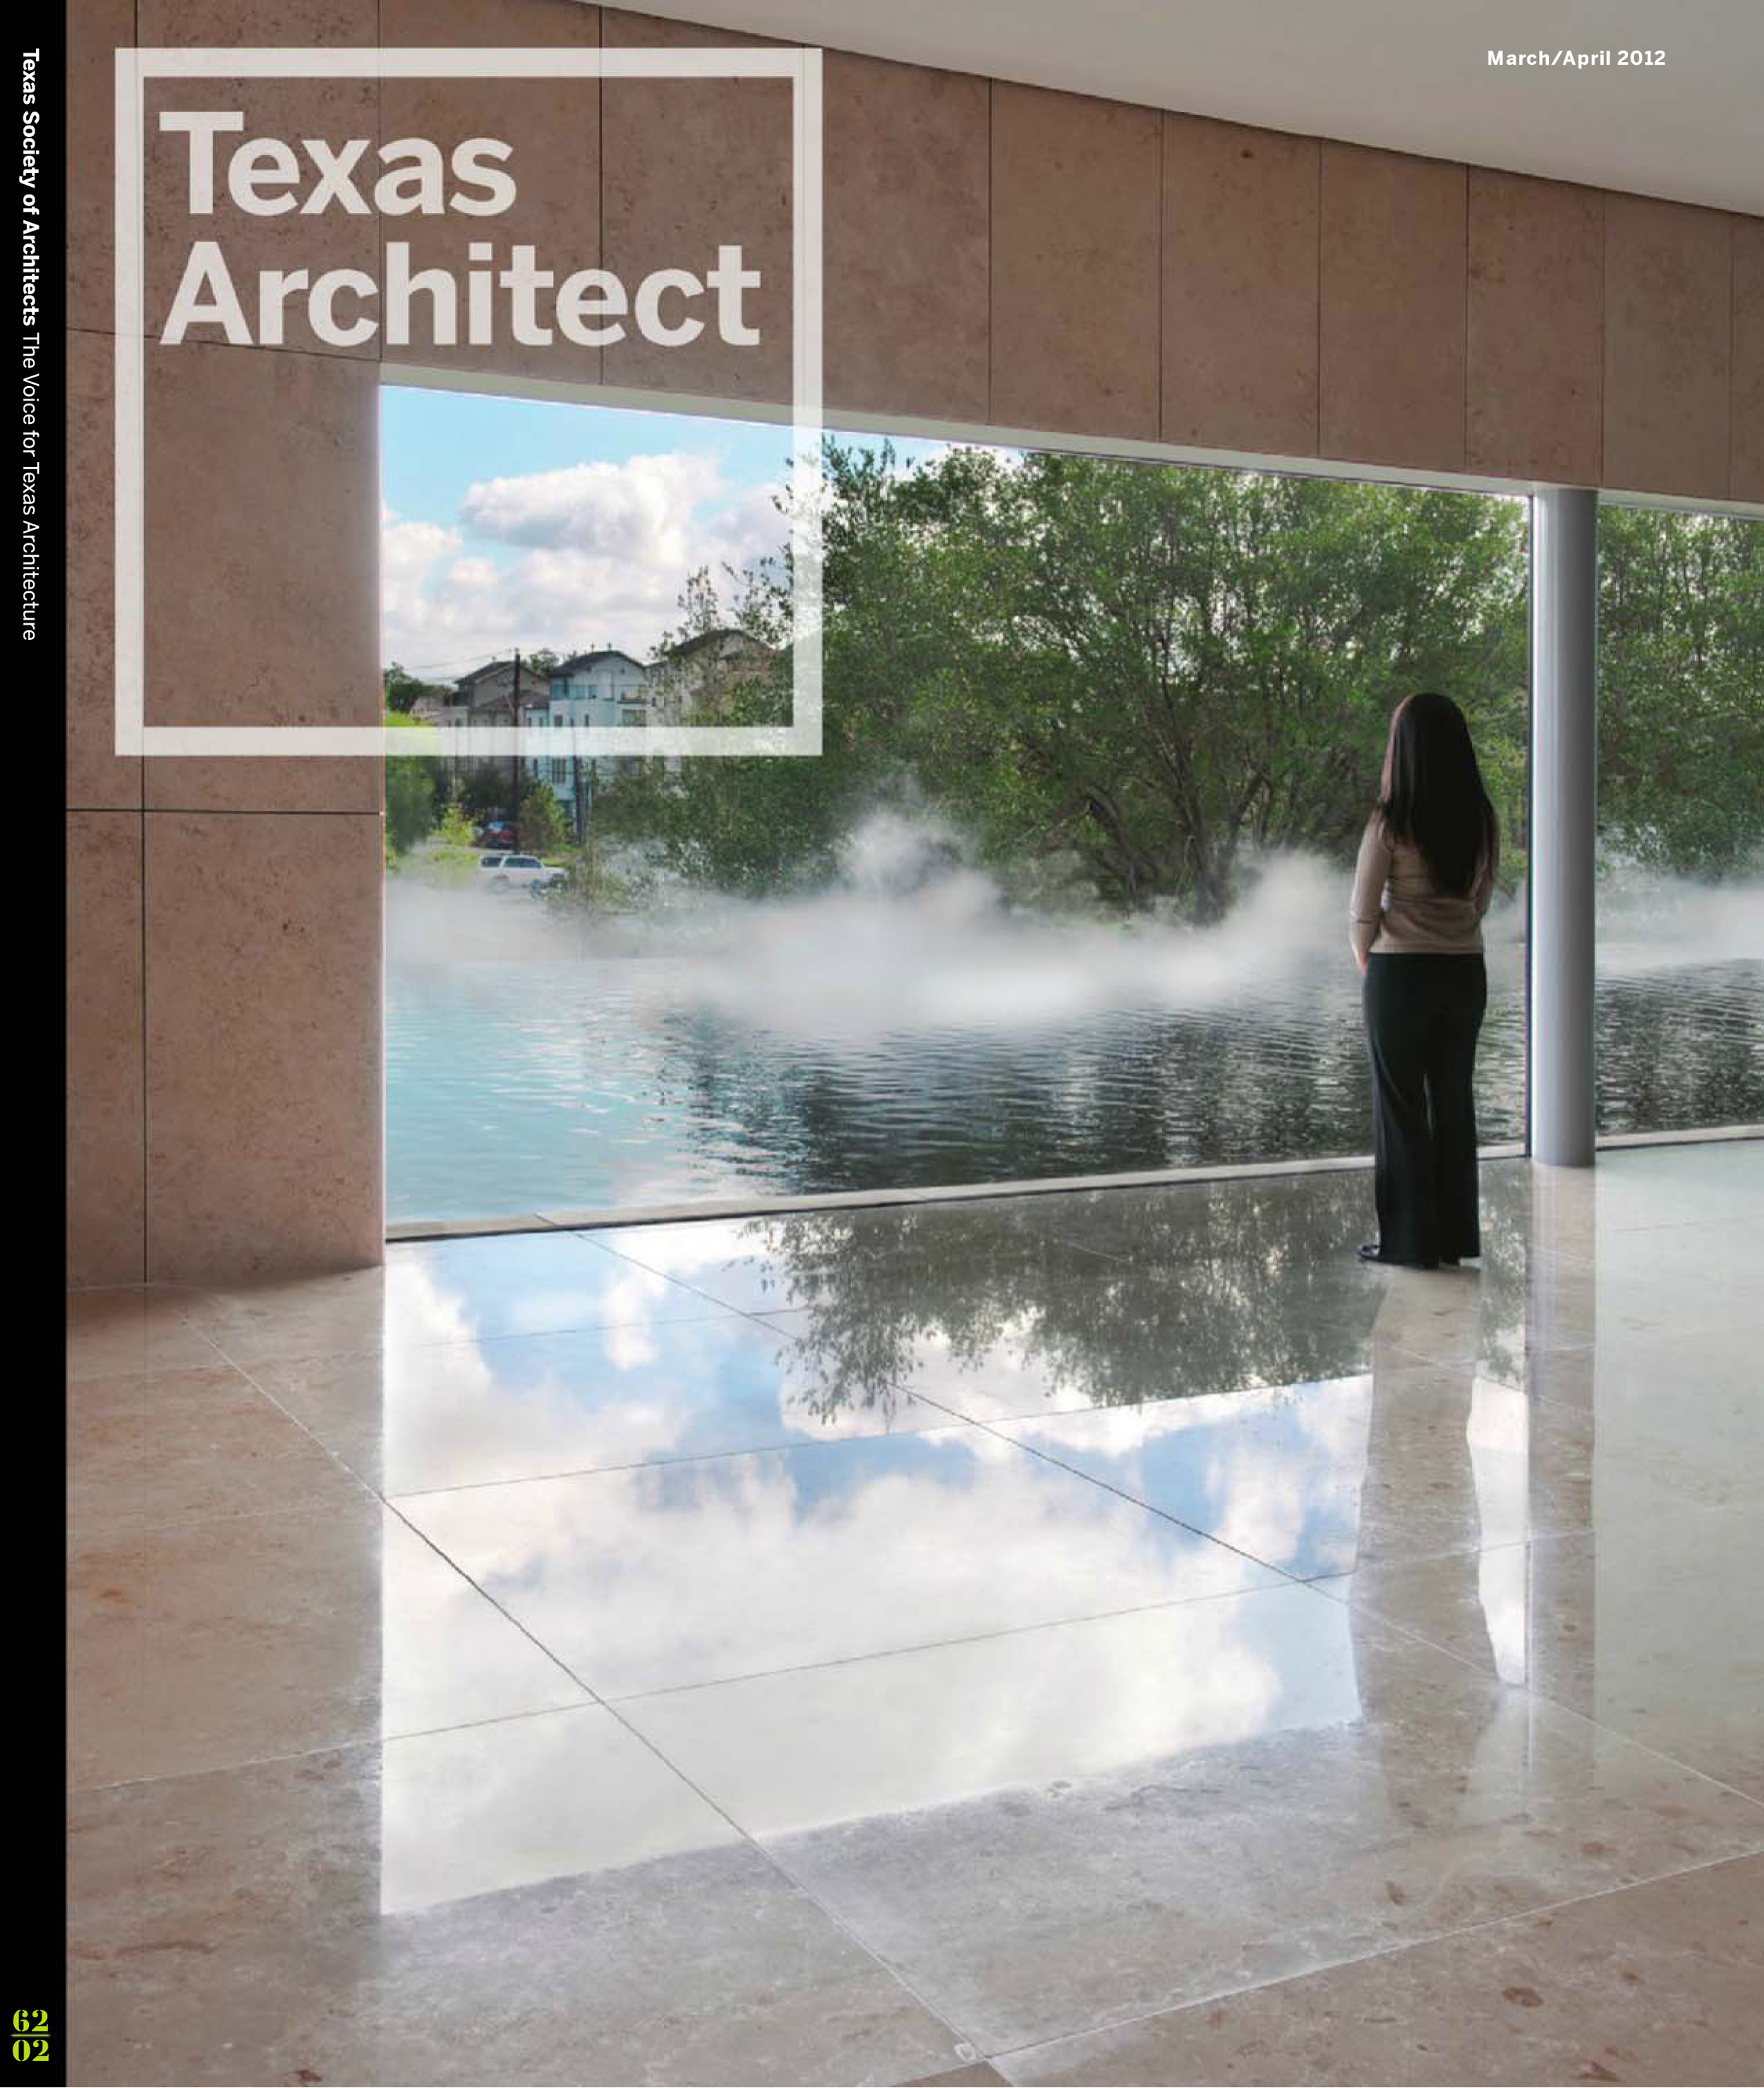 2012_03_Texas Architect_Cover.jpg